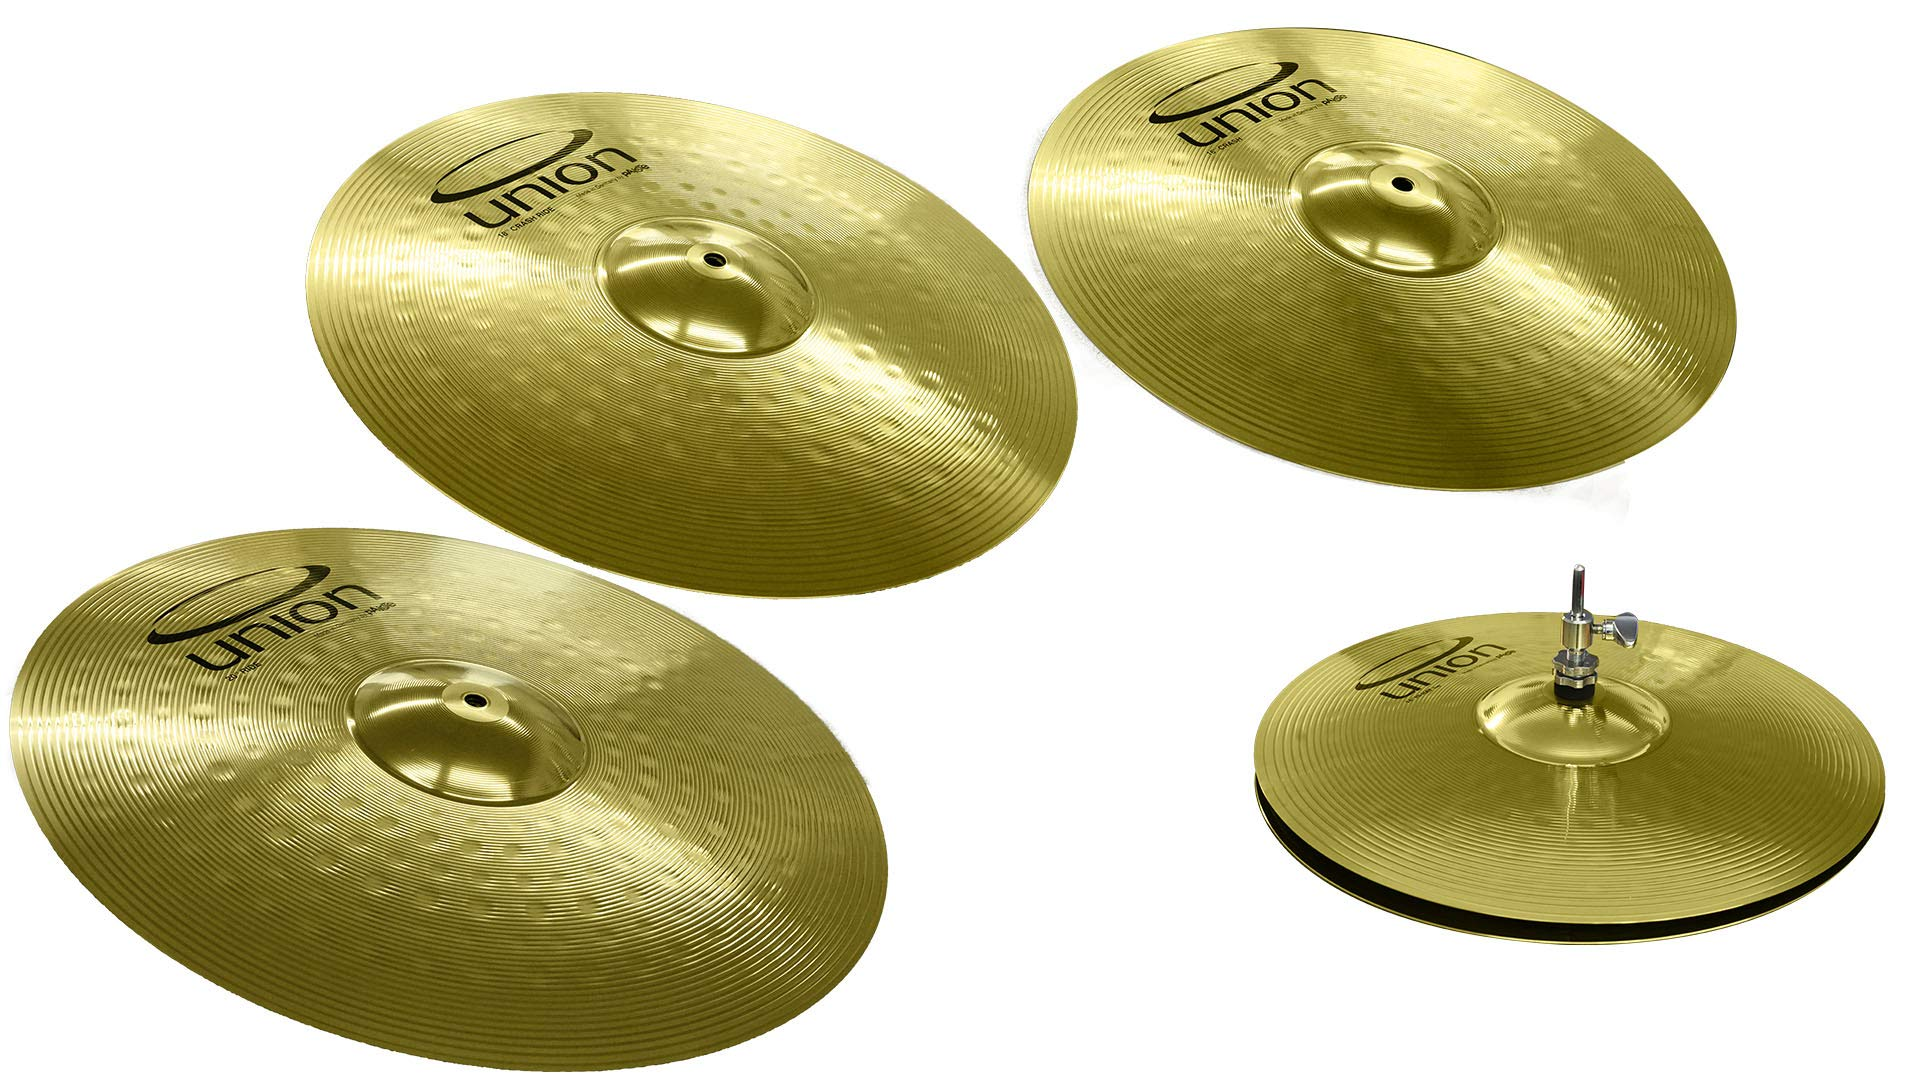 Union by by Paiste 5-Piece Brass Cymbal Set 14 inch Hi-Hats/16 Crash/18 Crash-Ride/20 inch Ride (OEMBEXKP)